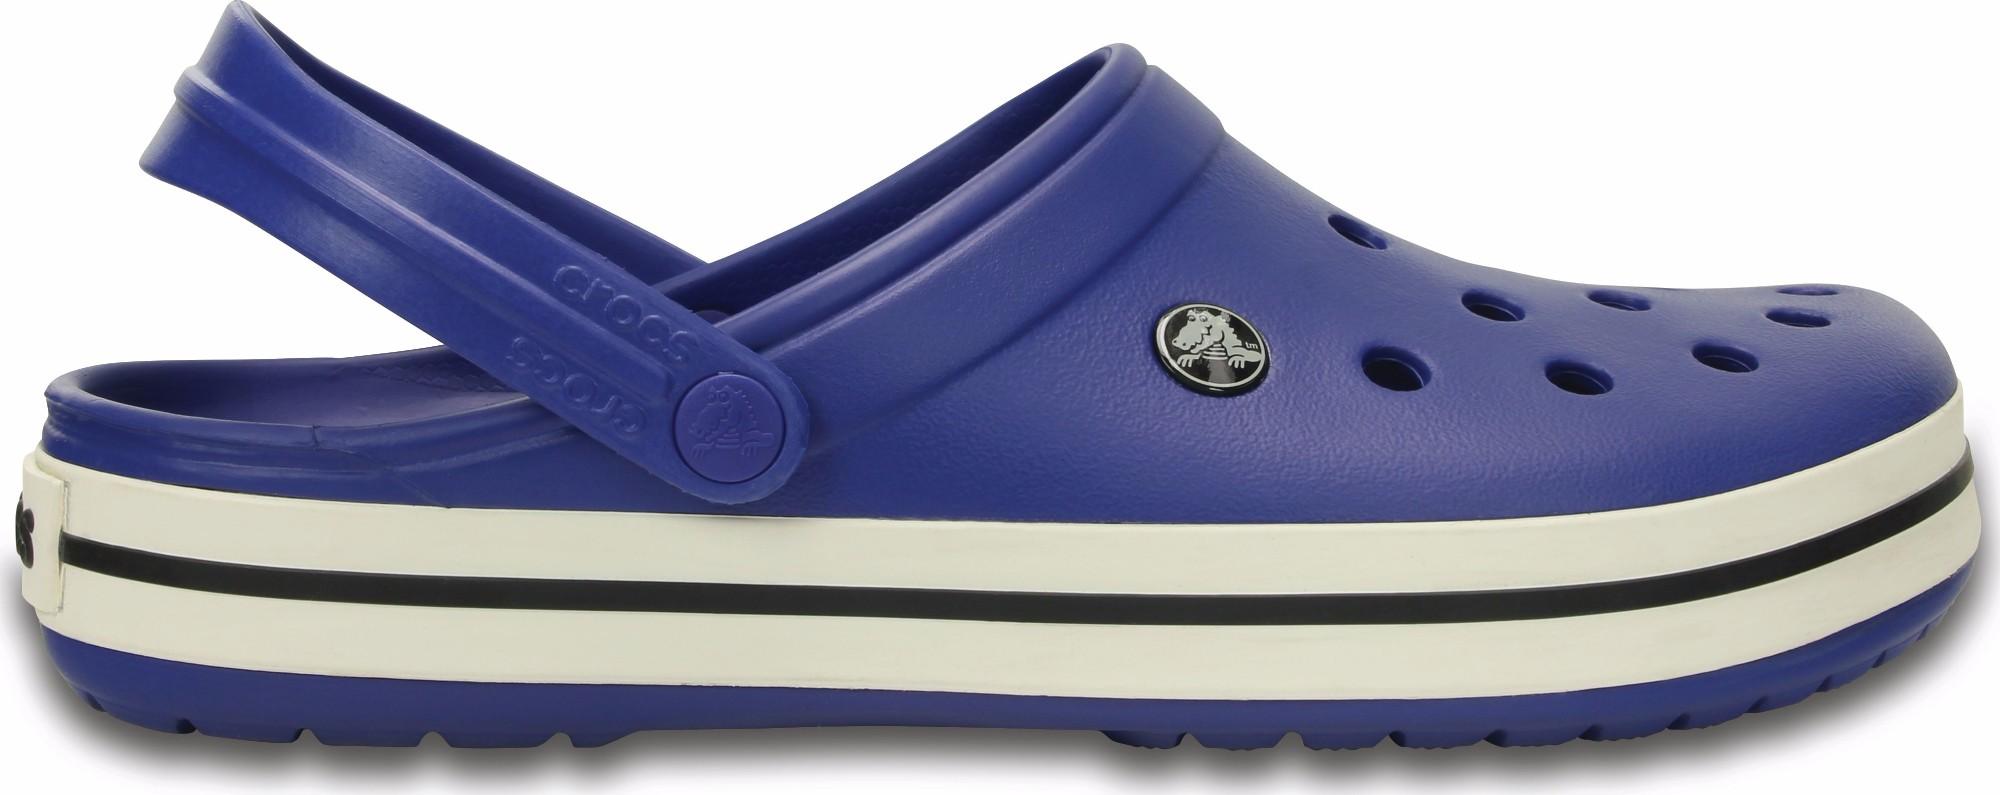 Crocs™ Crocband™ Cerulean Blue/Oyster 44,5